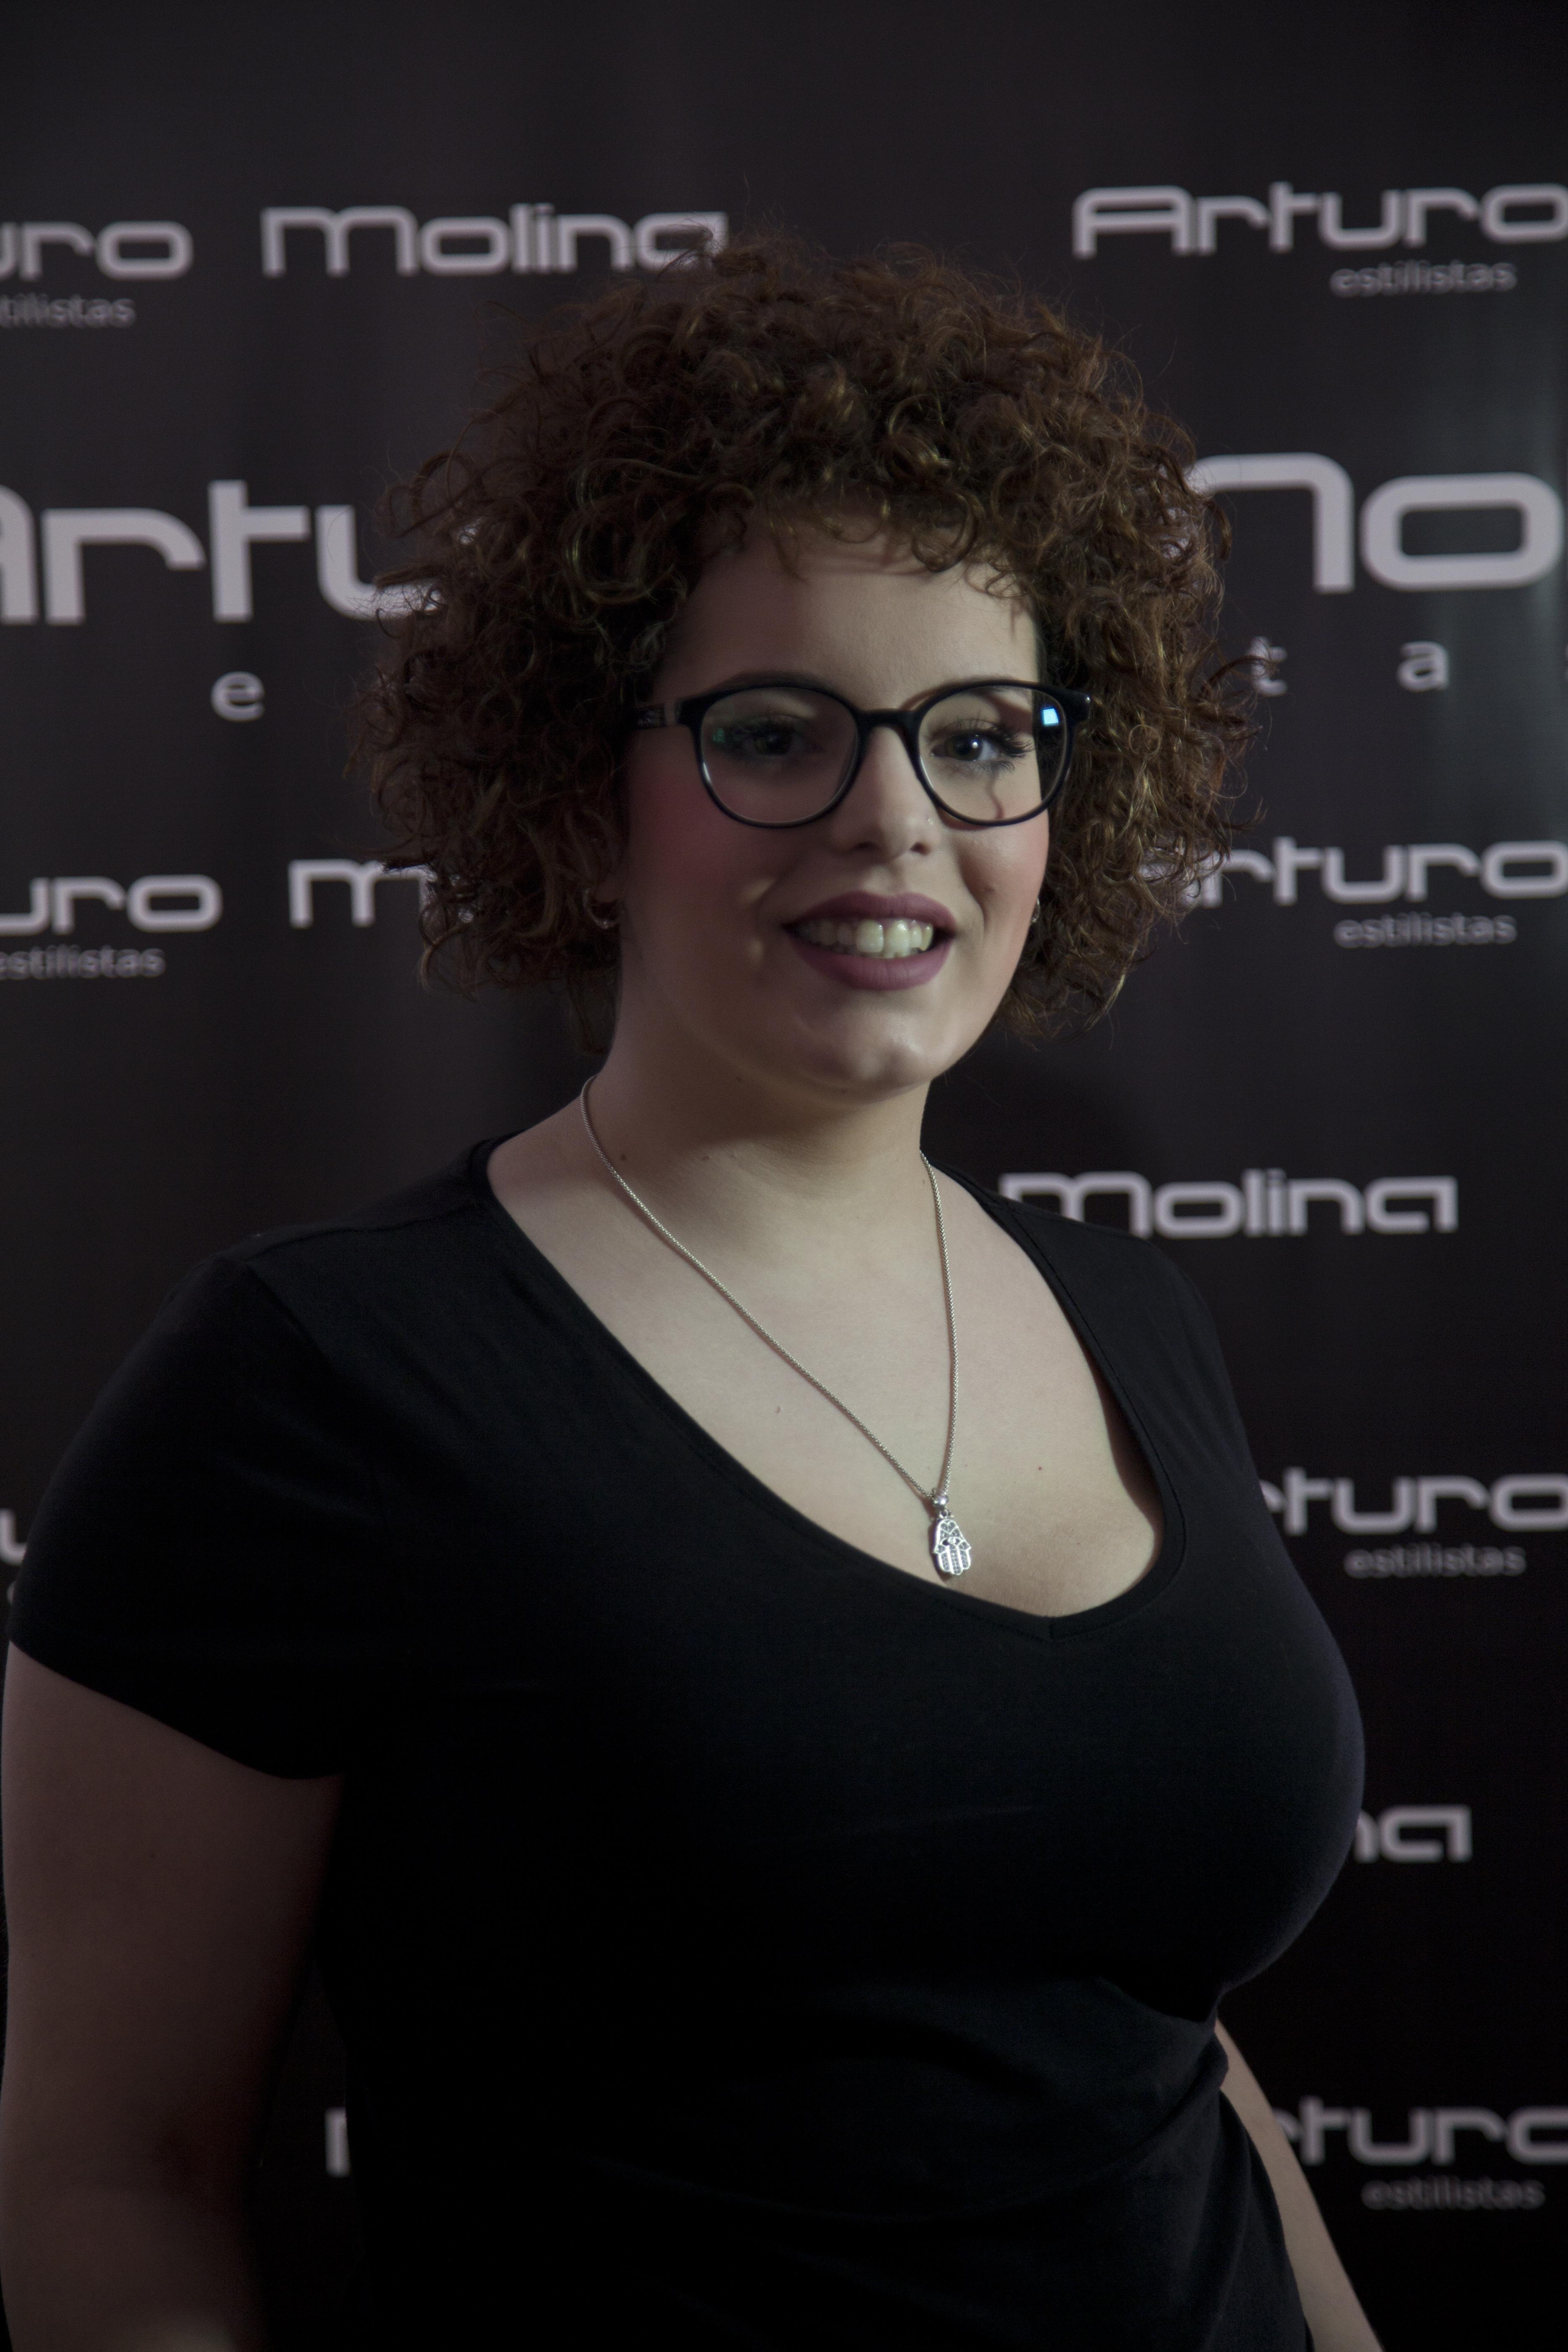 ArturoMOLINA-35